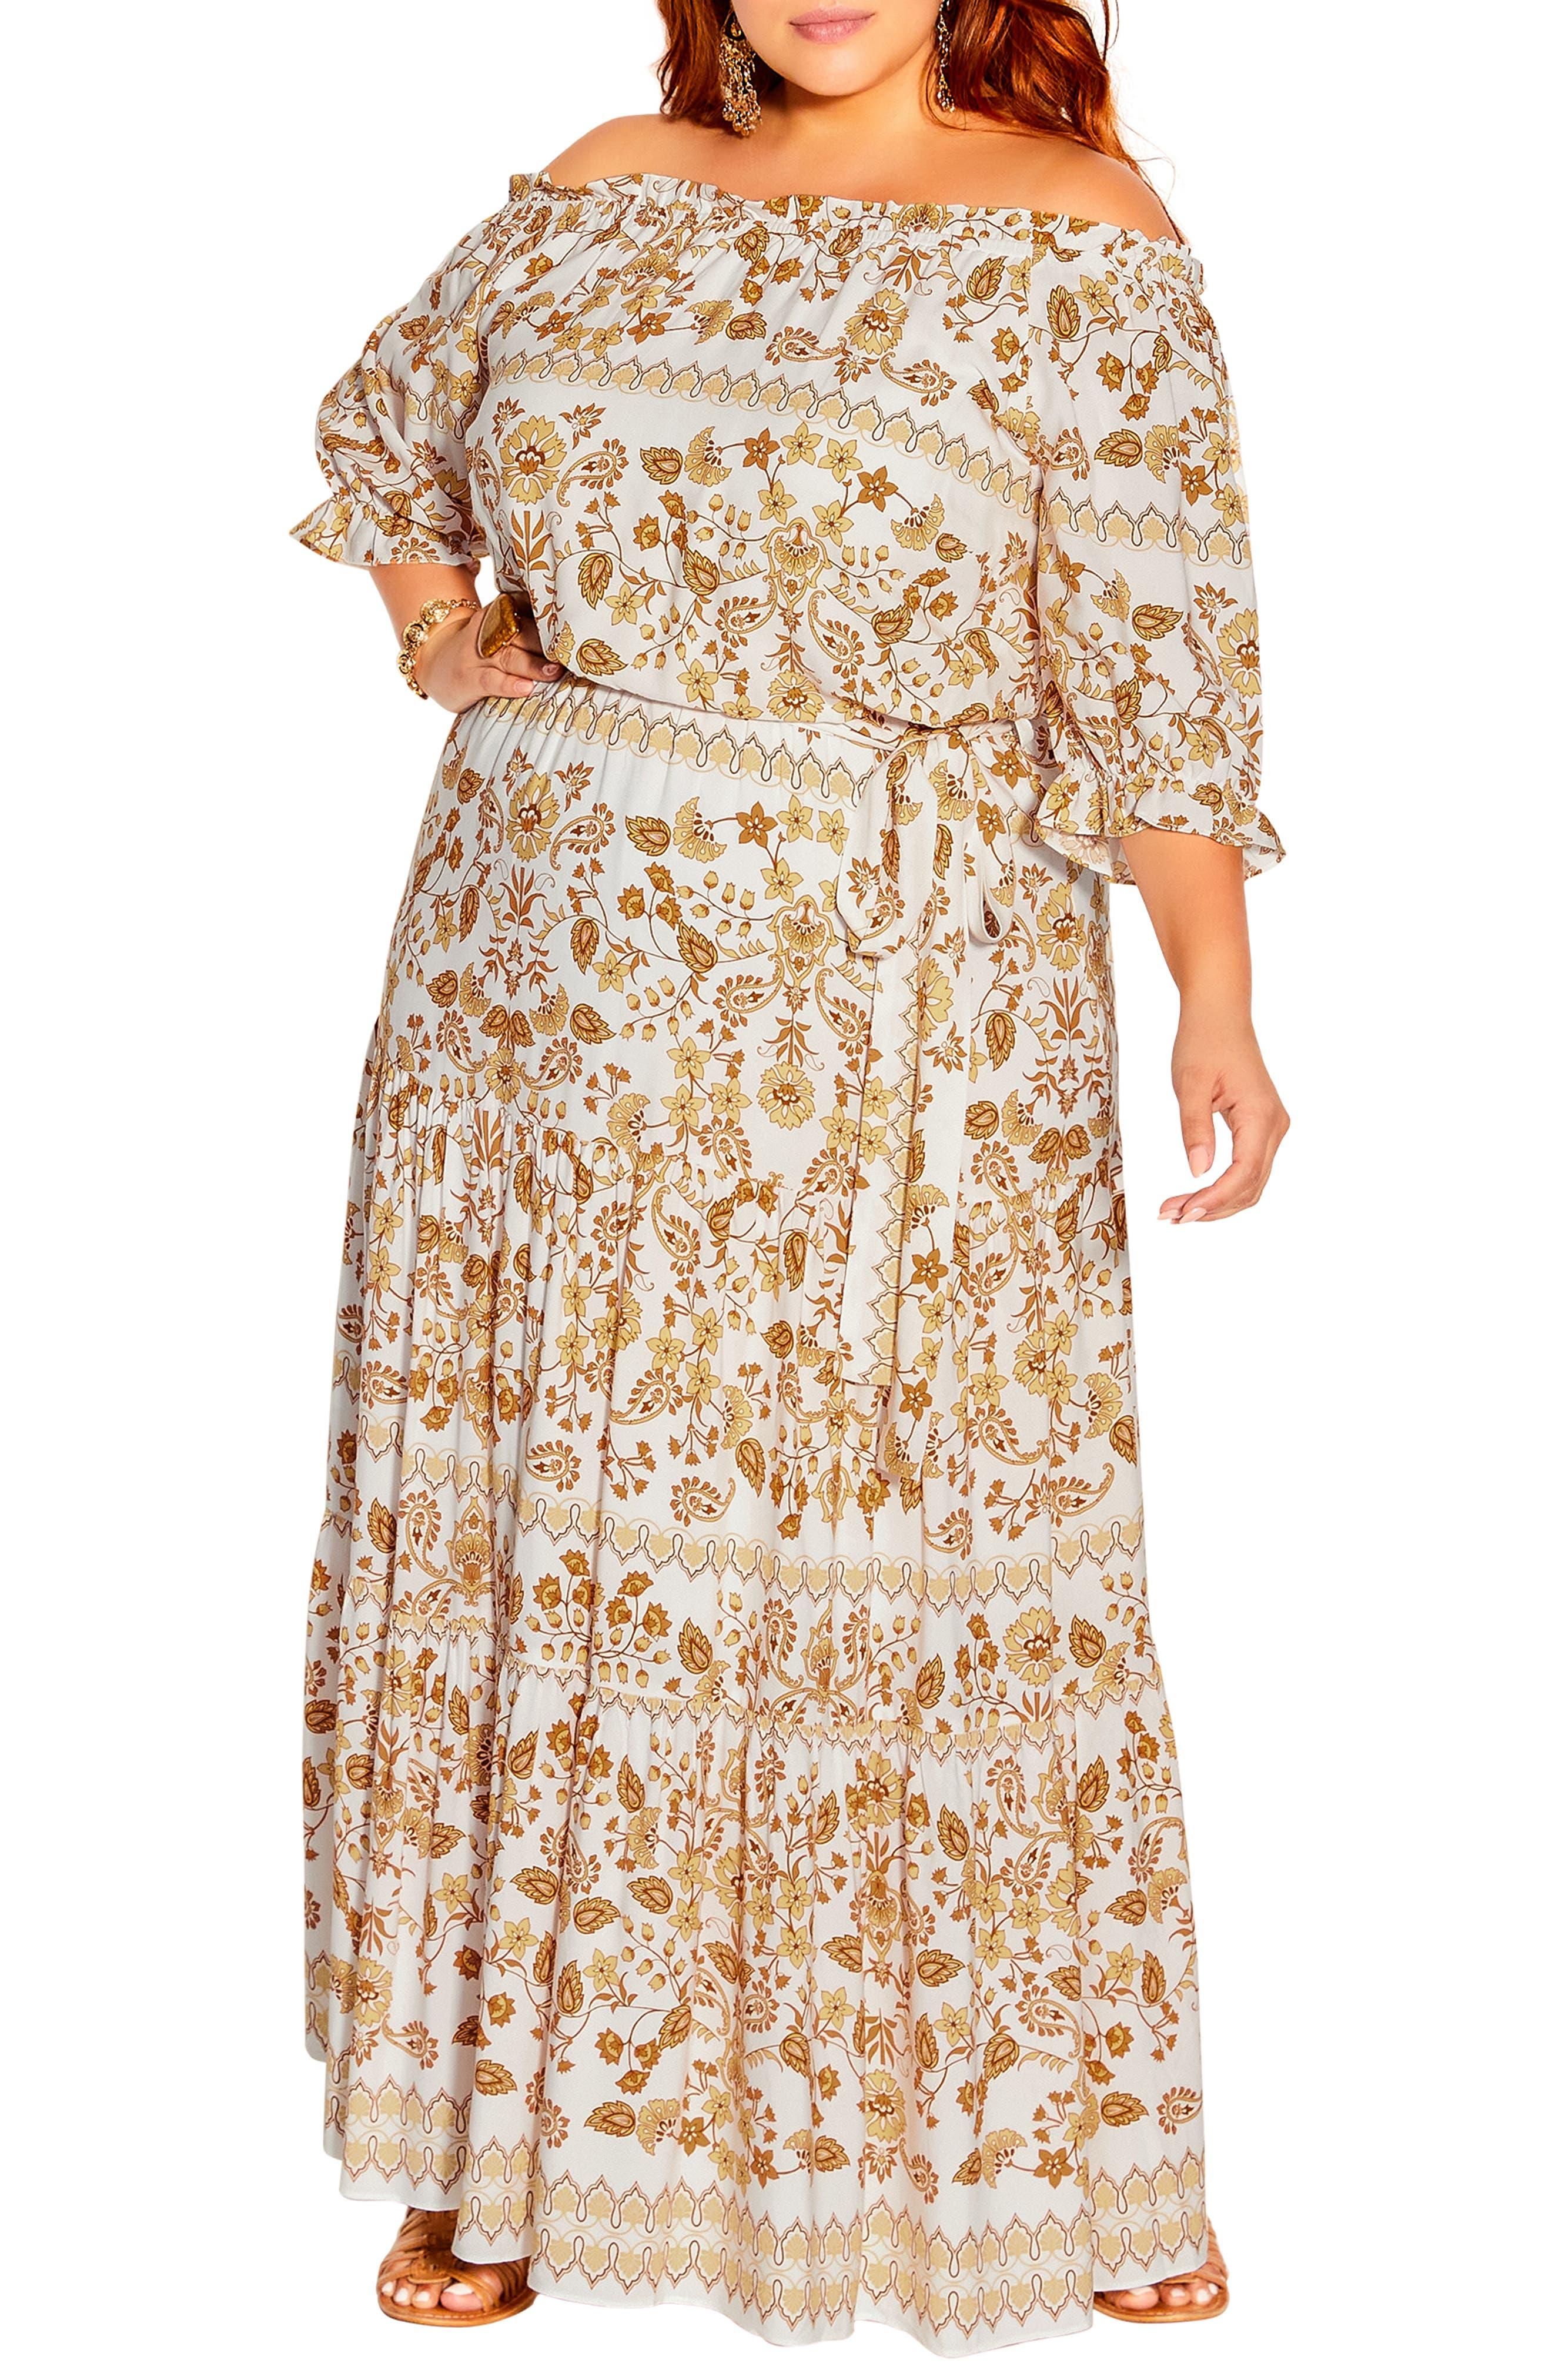 70s Dresses – Disco Dress, Hippie Dress, Wrap Dress Plus Size Womens City Chic Nisha Floral Maxi Dress Size XX-Small - White $129.00 AT vintagedancer.com